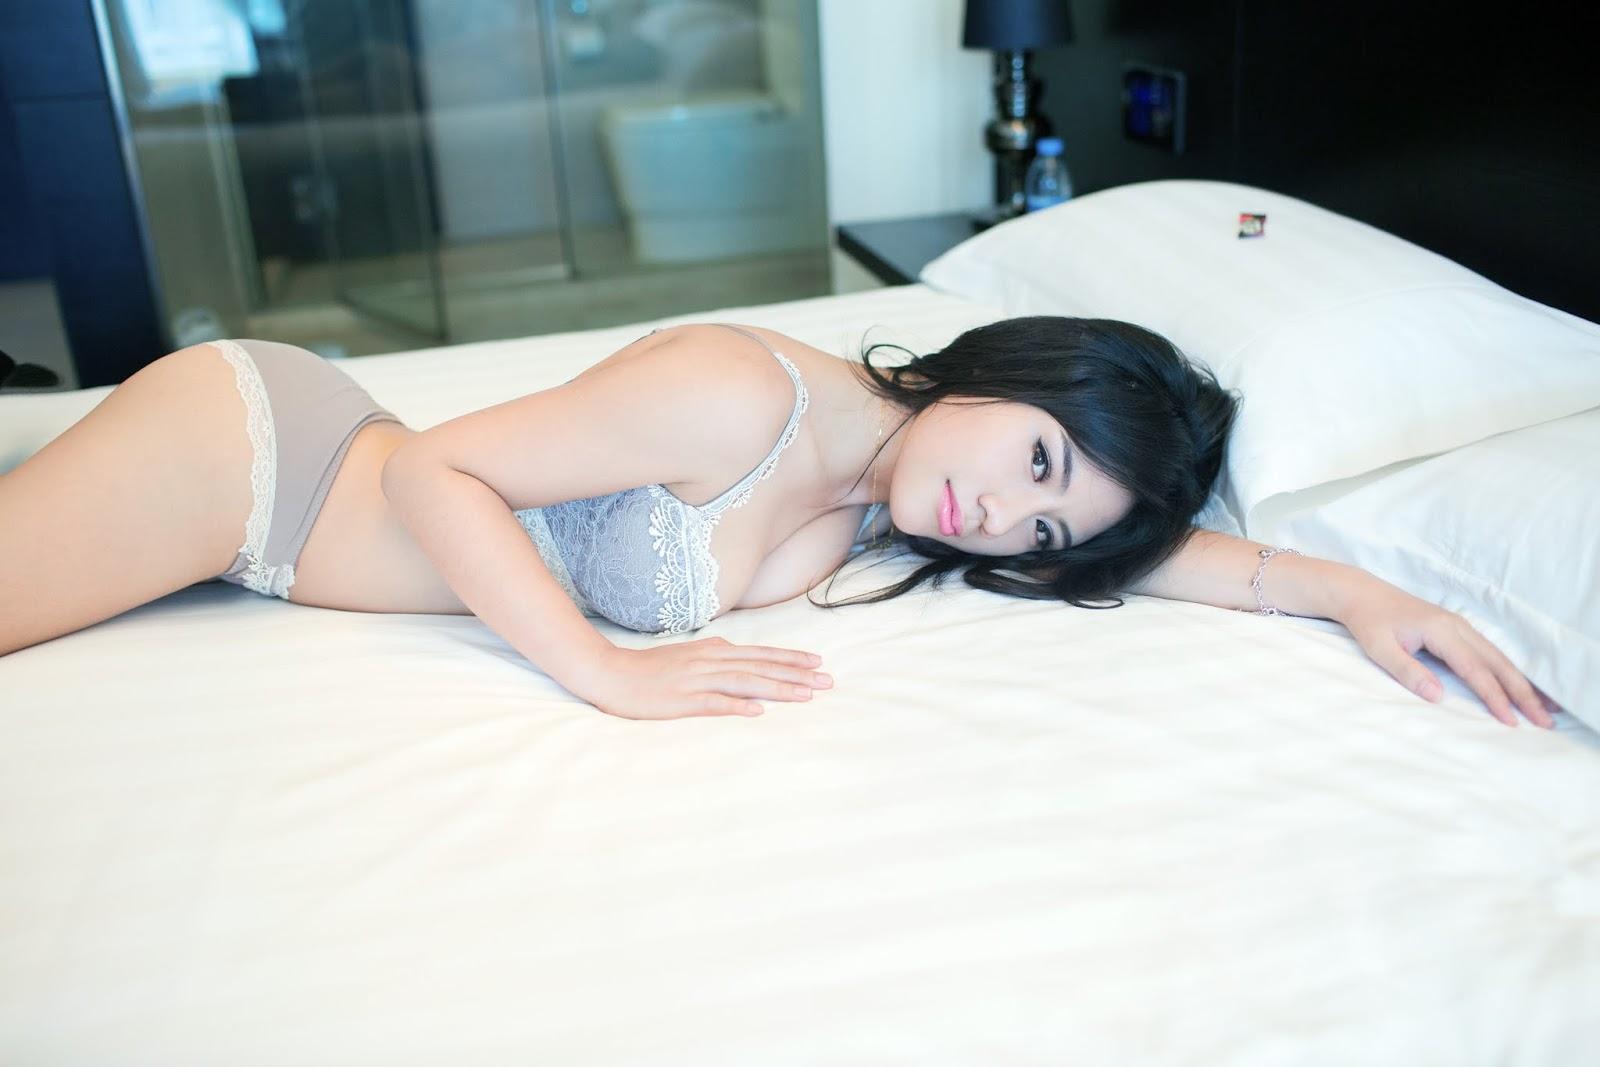 %25C2%25AC%252BO 03 - Hot Sexy Model TUIGIRL NO.46 Nude